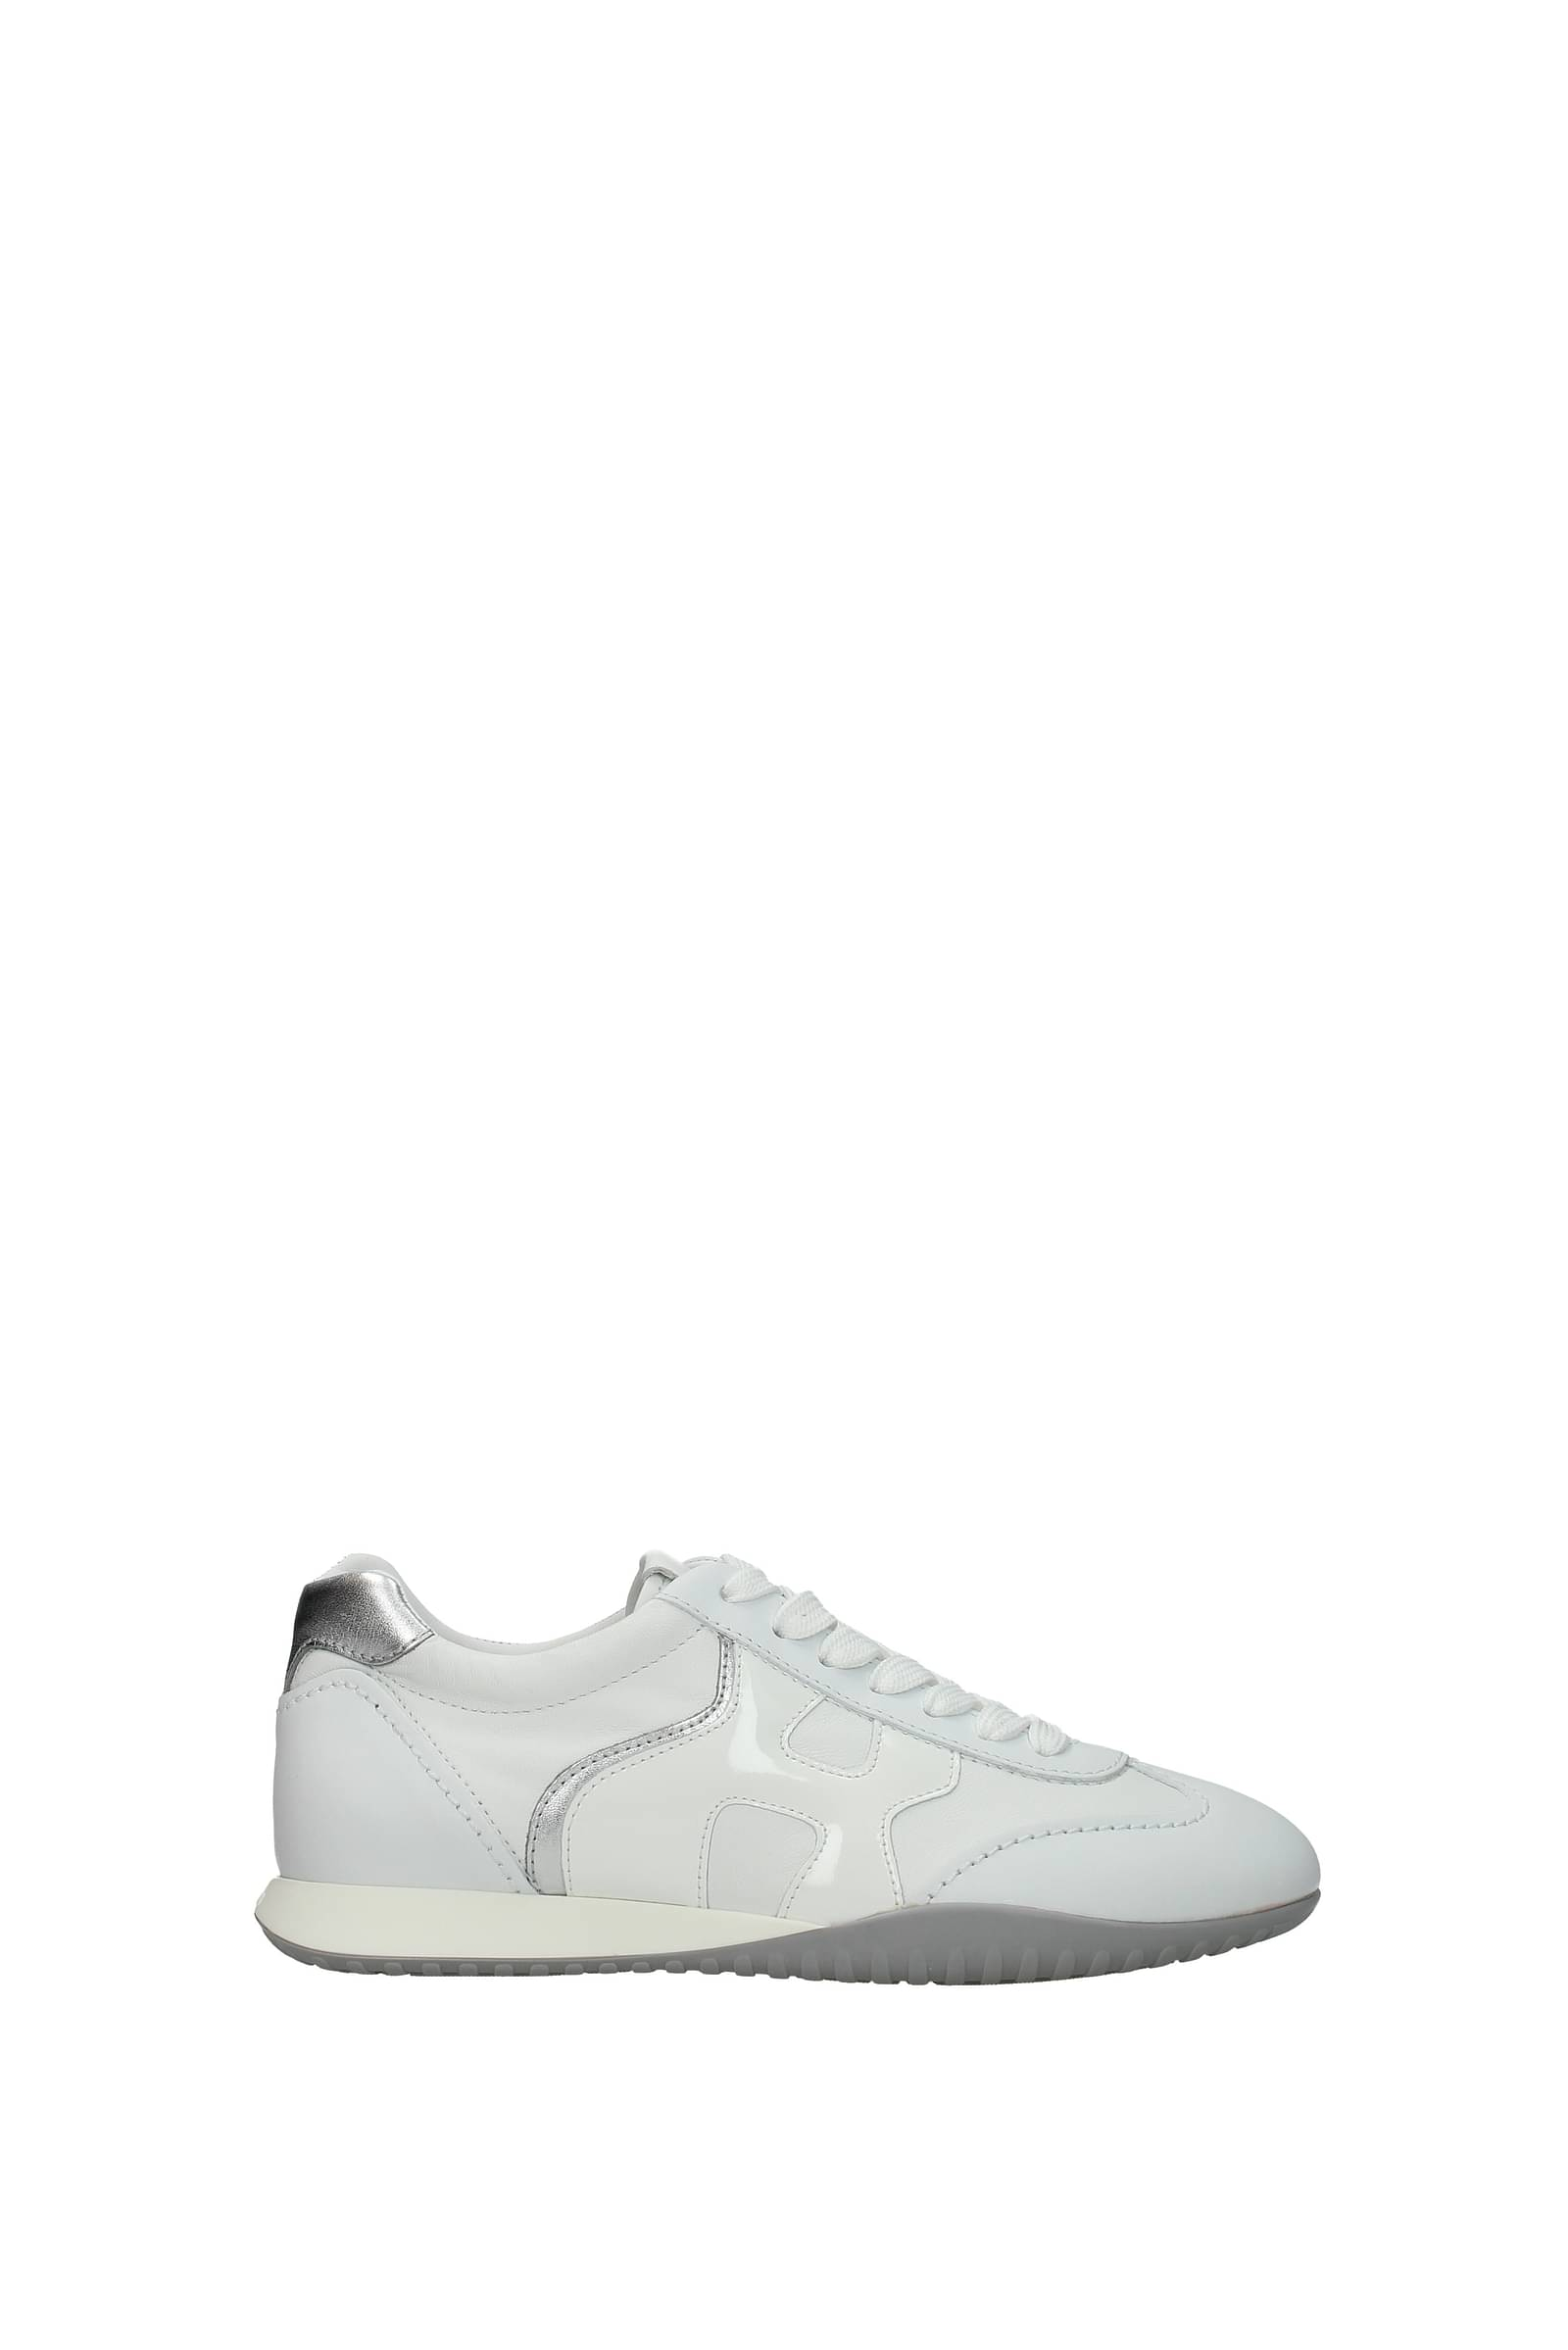 Hogan Sneakers olympia z Donna HXW5650DO00POJ0351 Pelle 320€